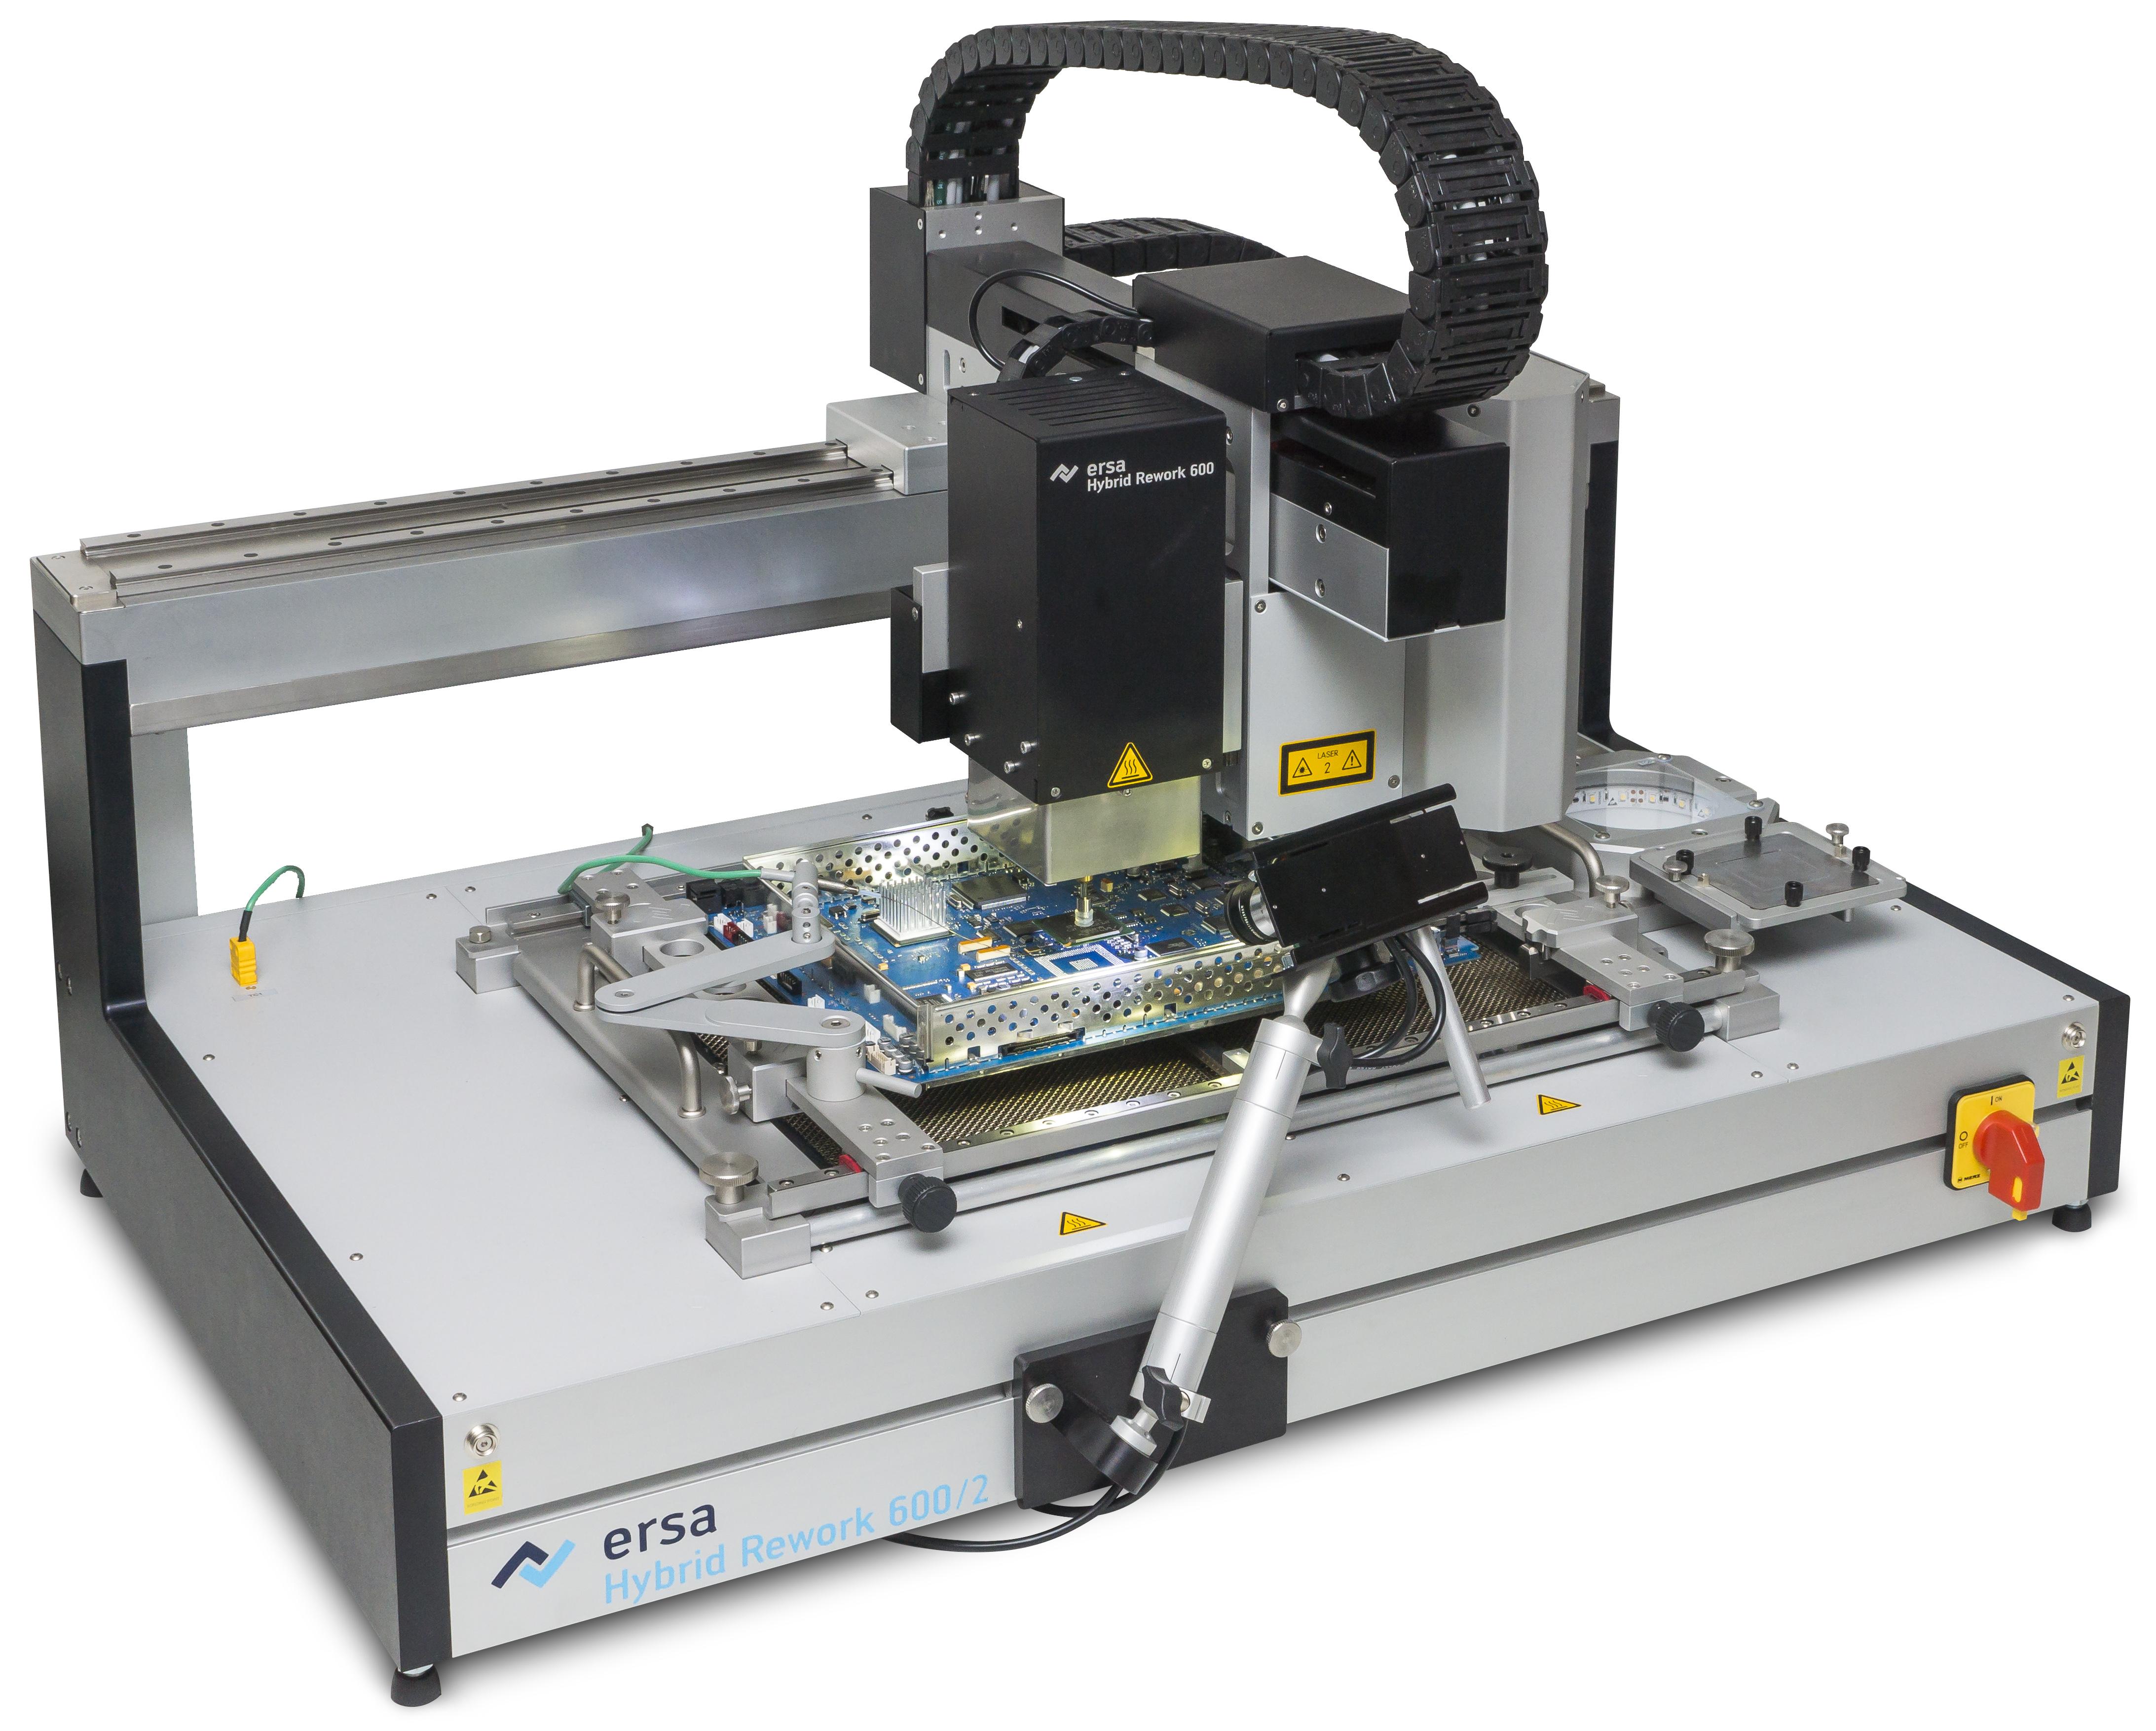 HR 600